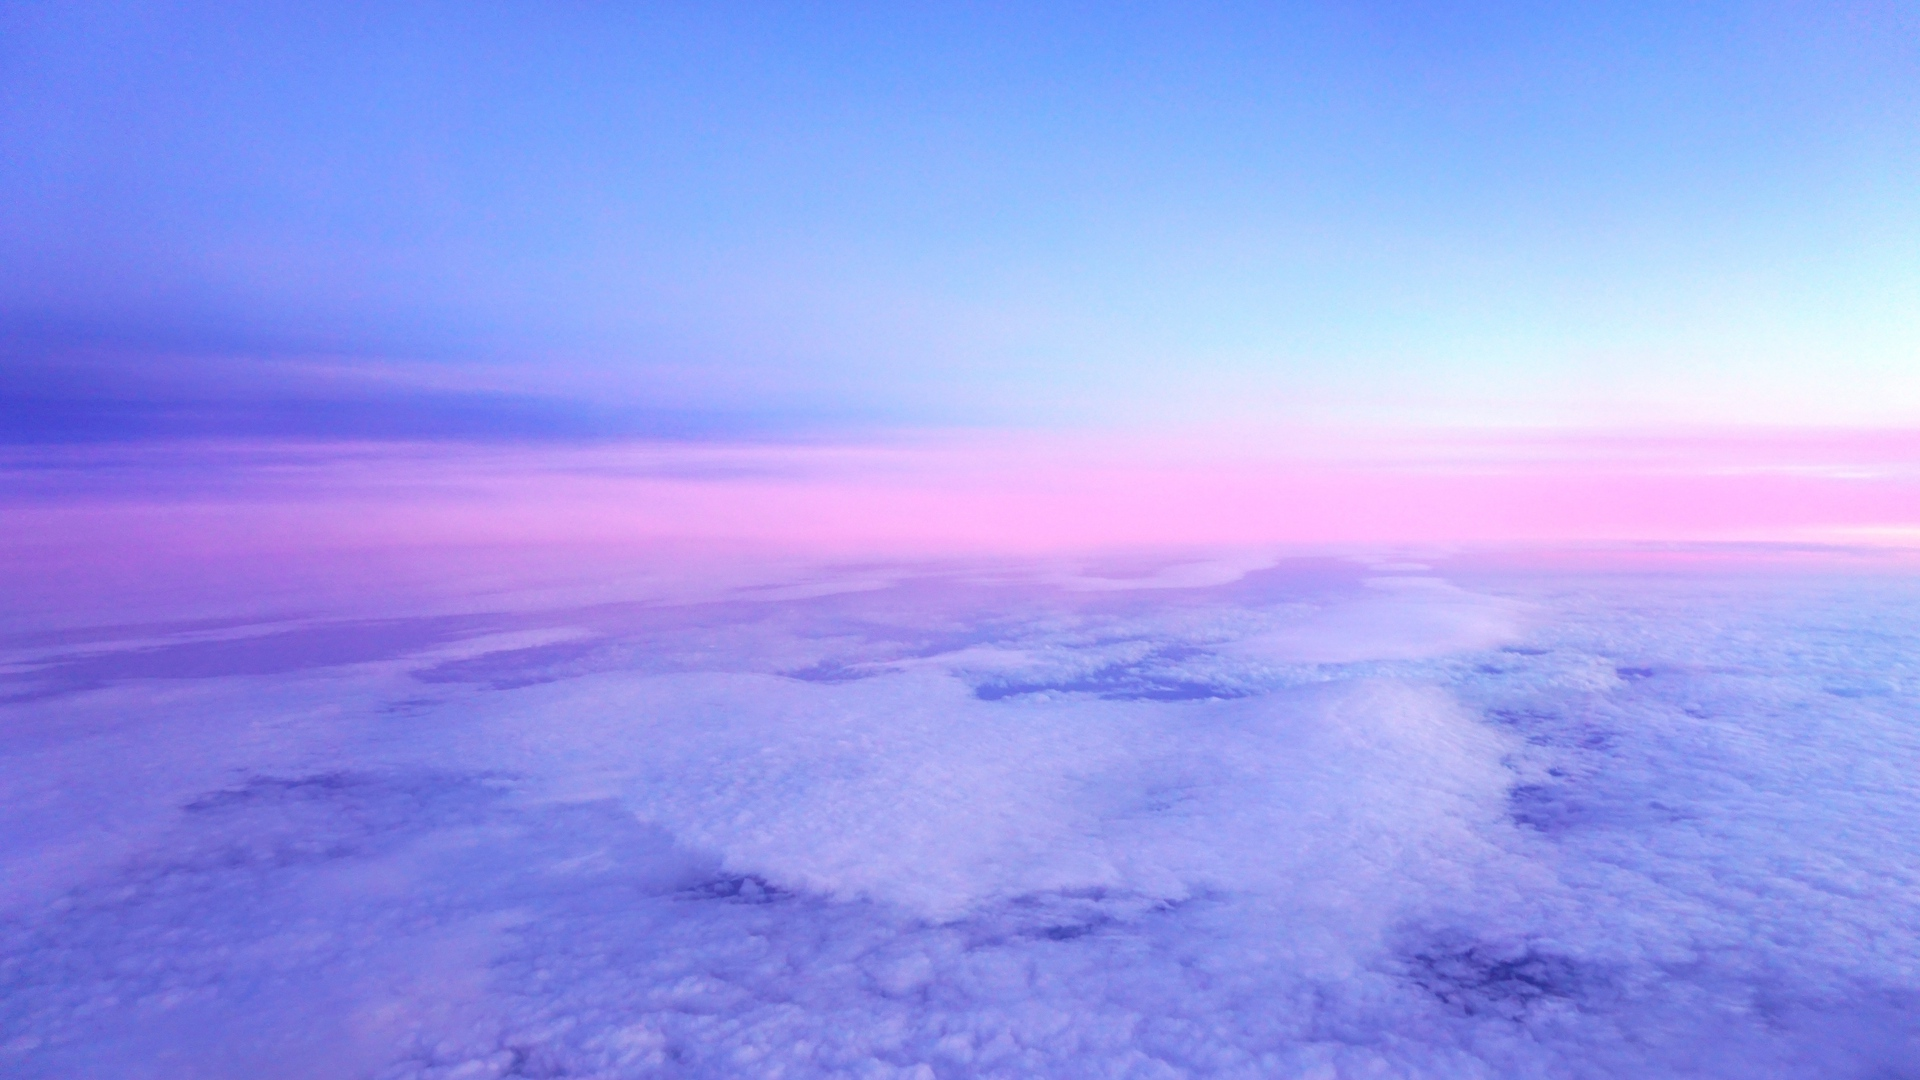 Download wallpaper 1920x1080 clouds porous horizon pink lilac 1920x1080